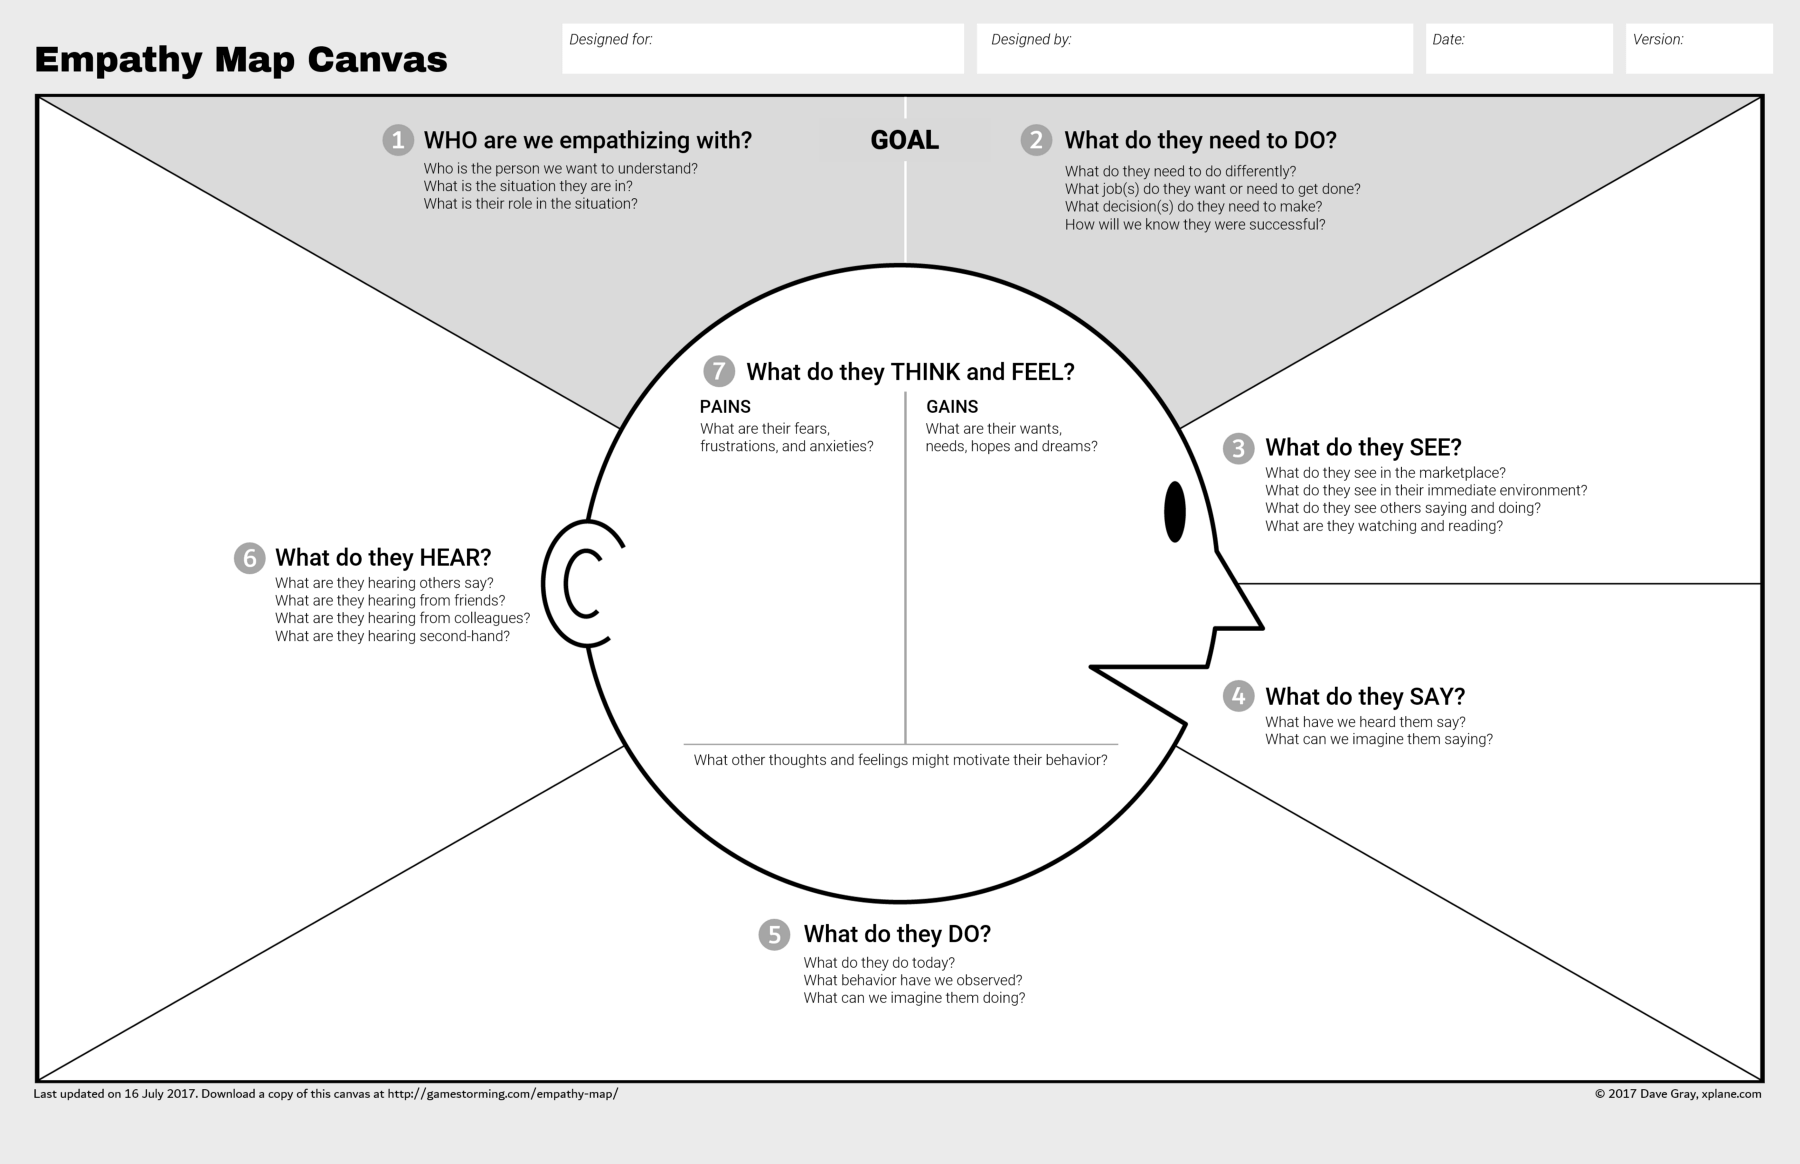 empathy map canvas dave gray